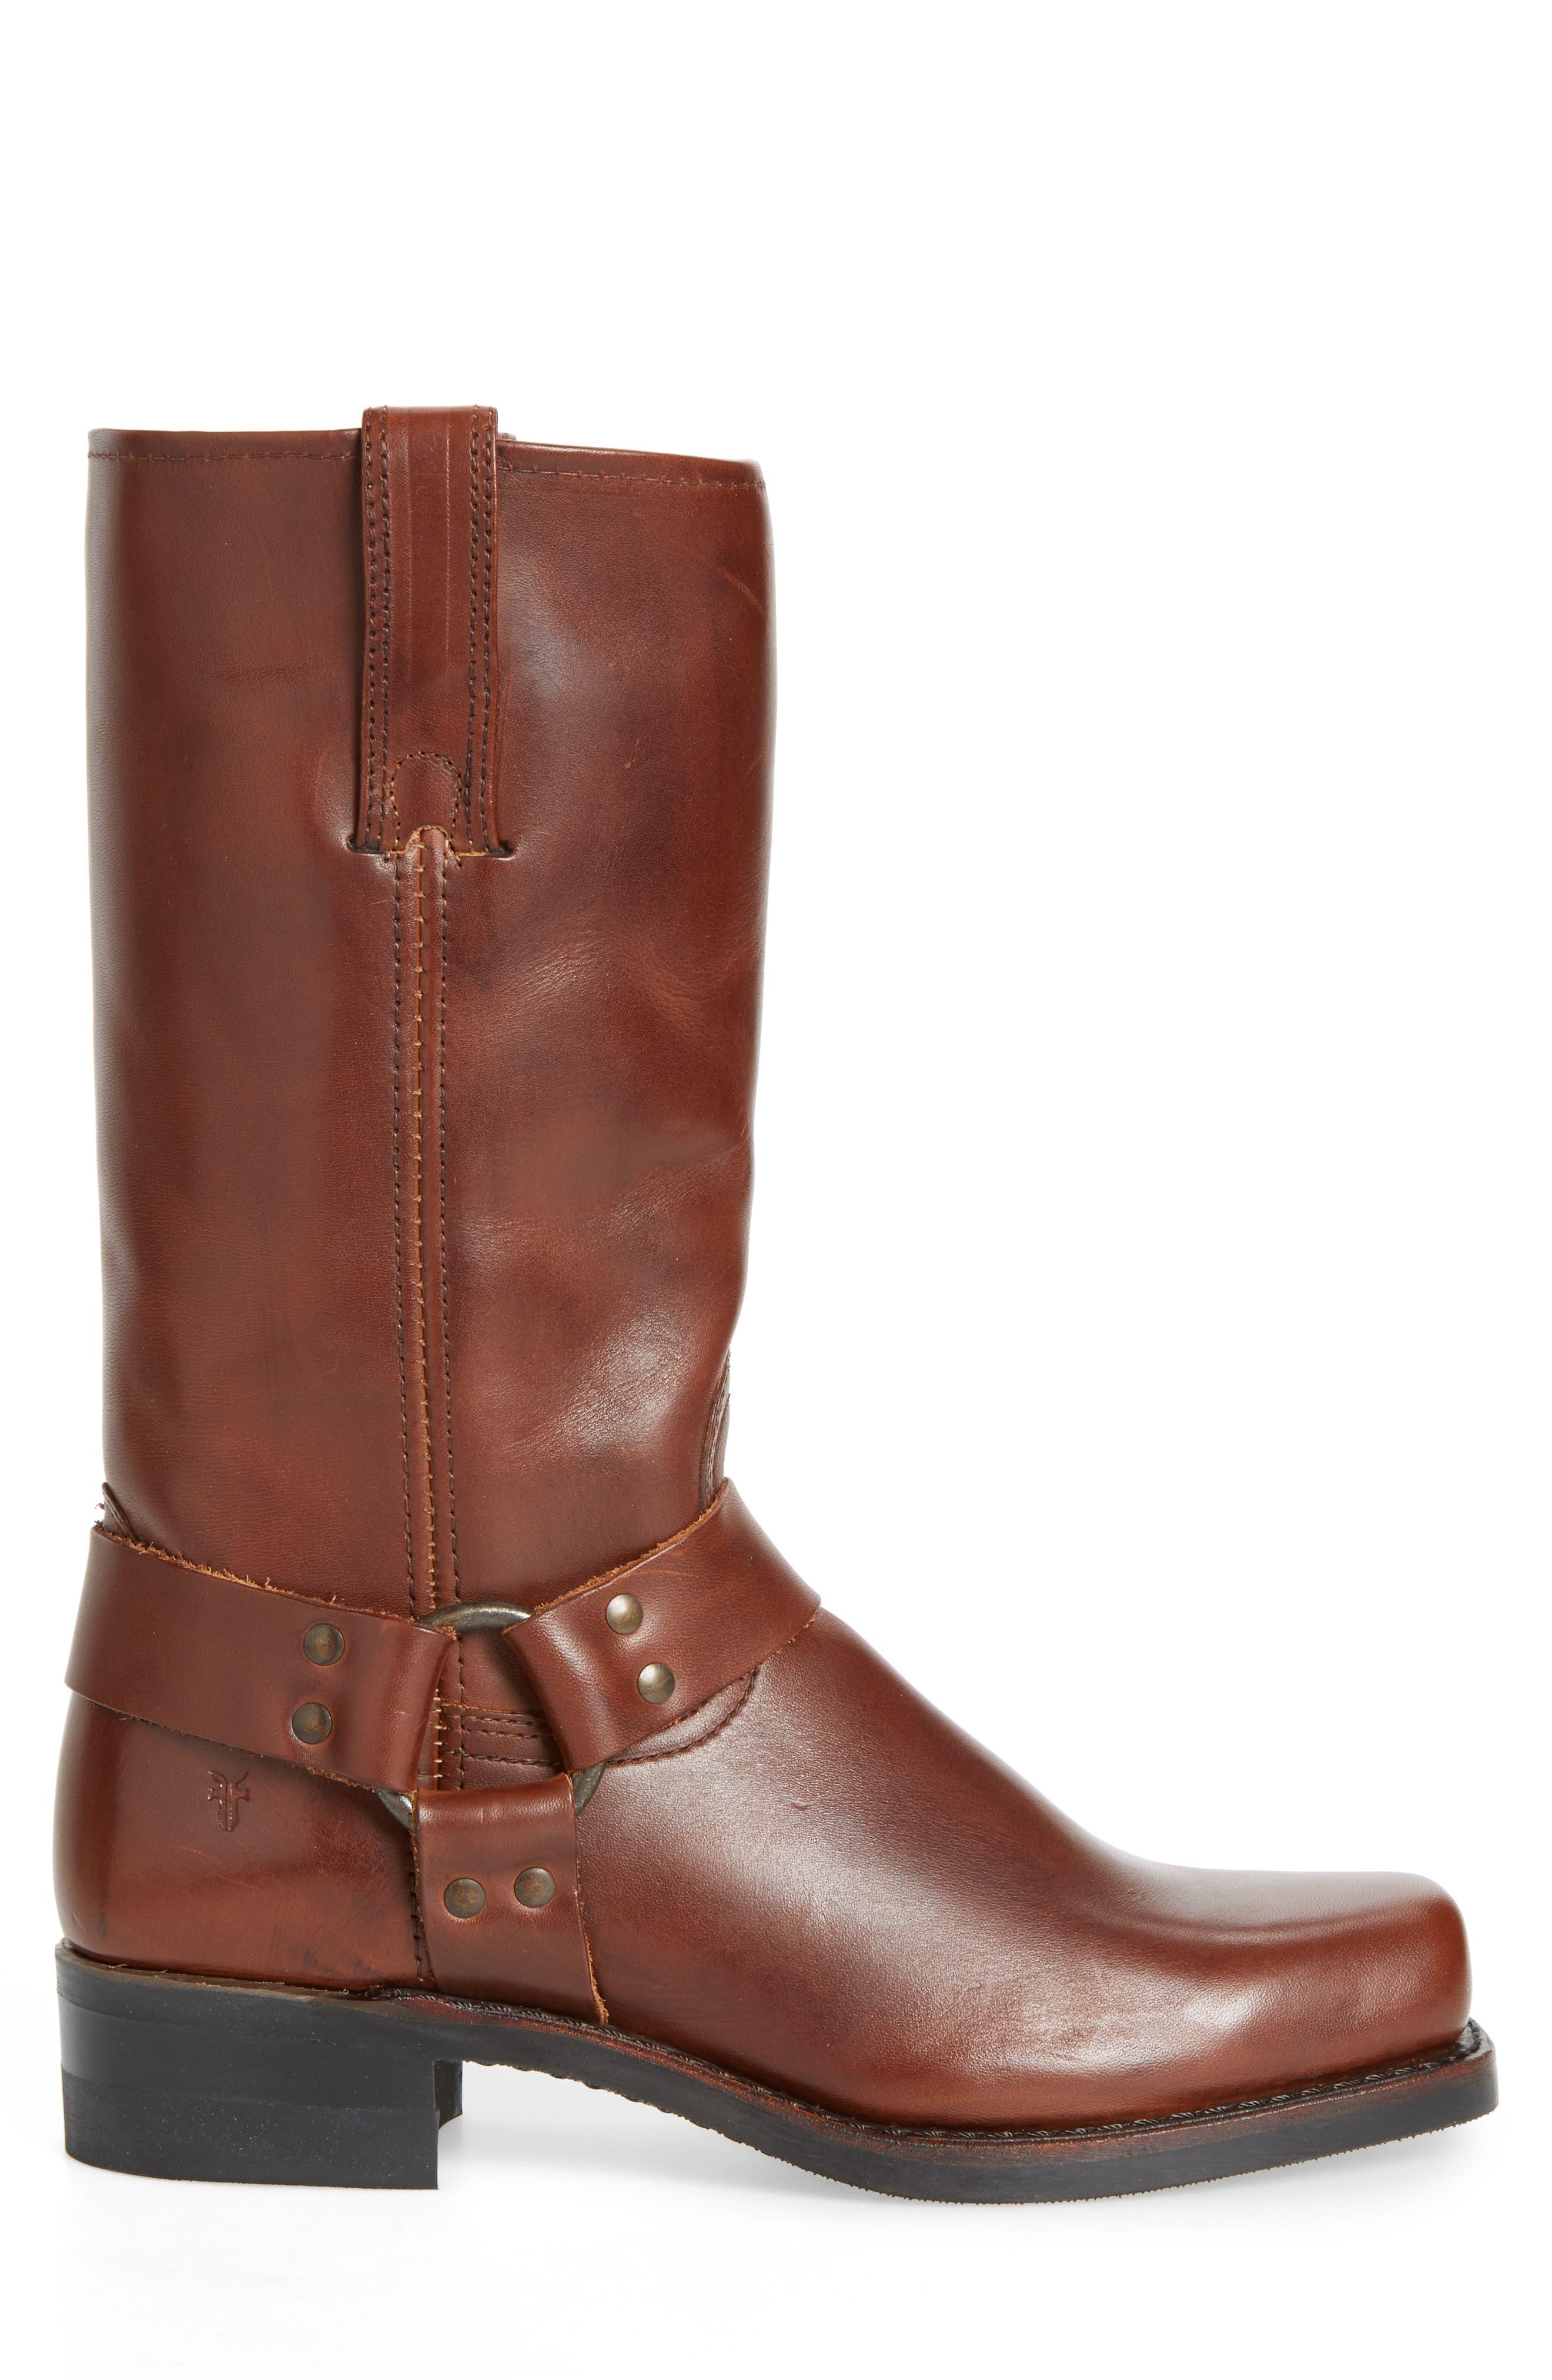 12R Harness Boot,                             Alternate thumbnail 3, color,                             Walnut